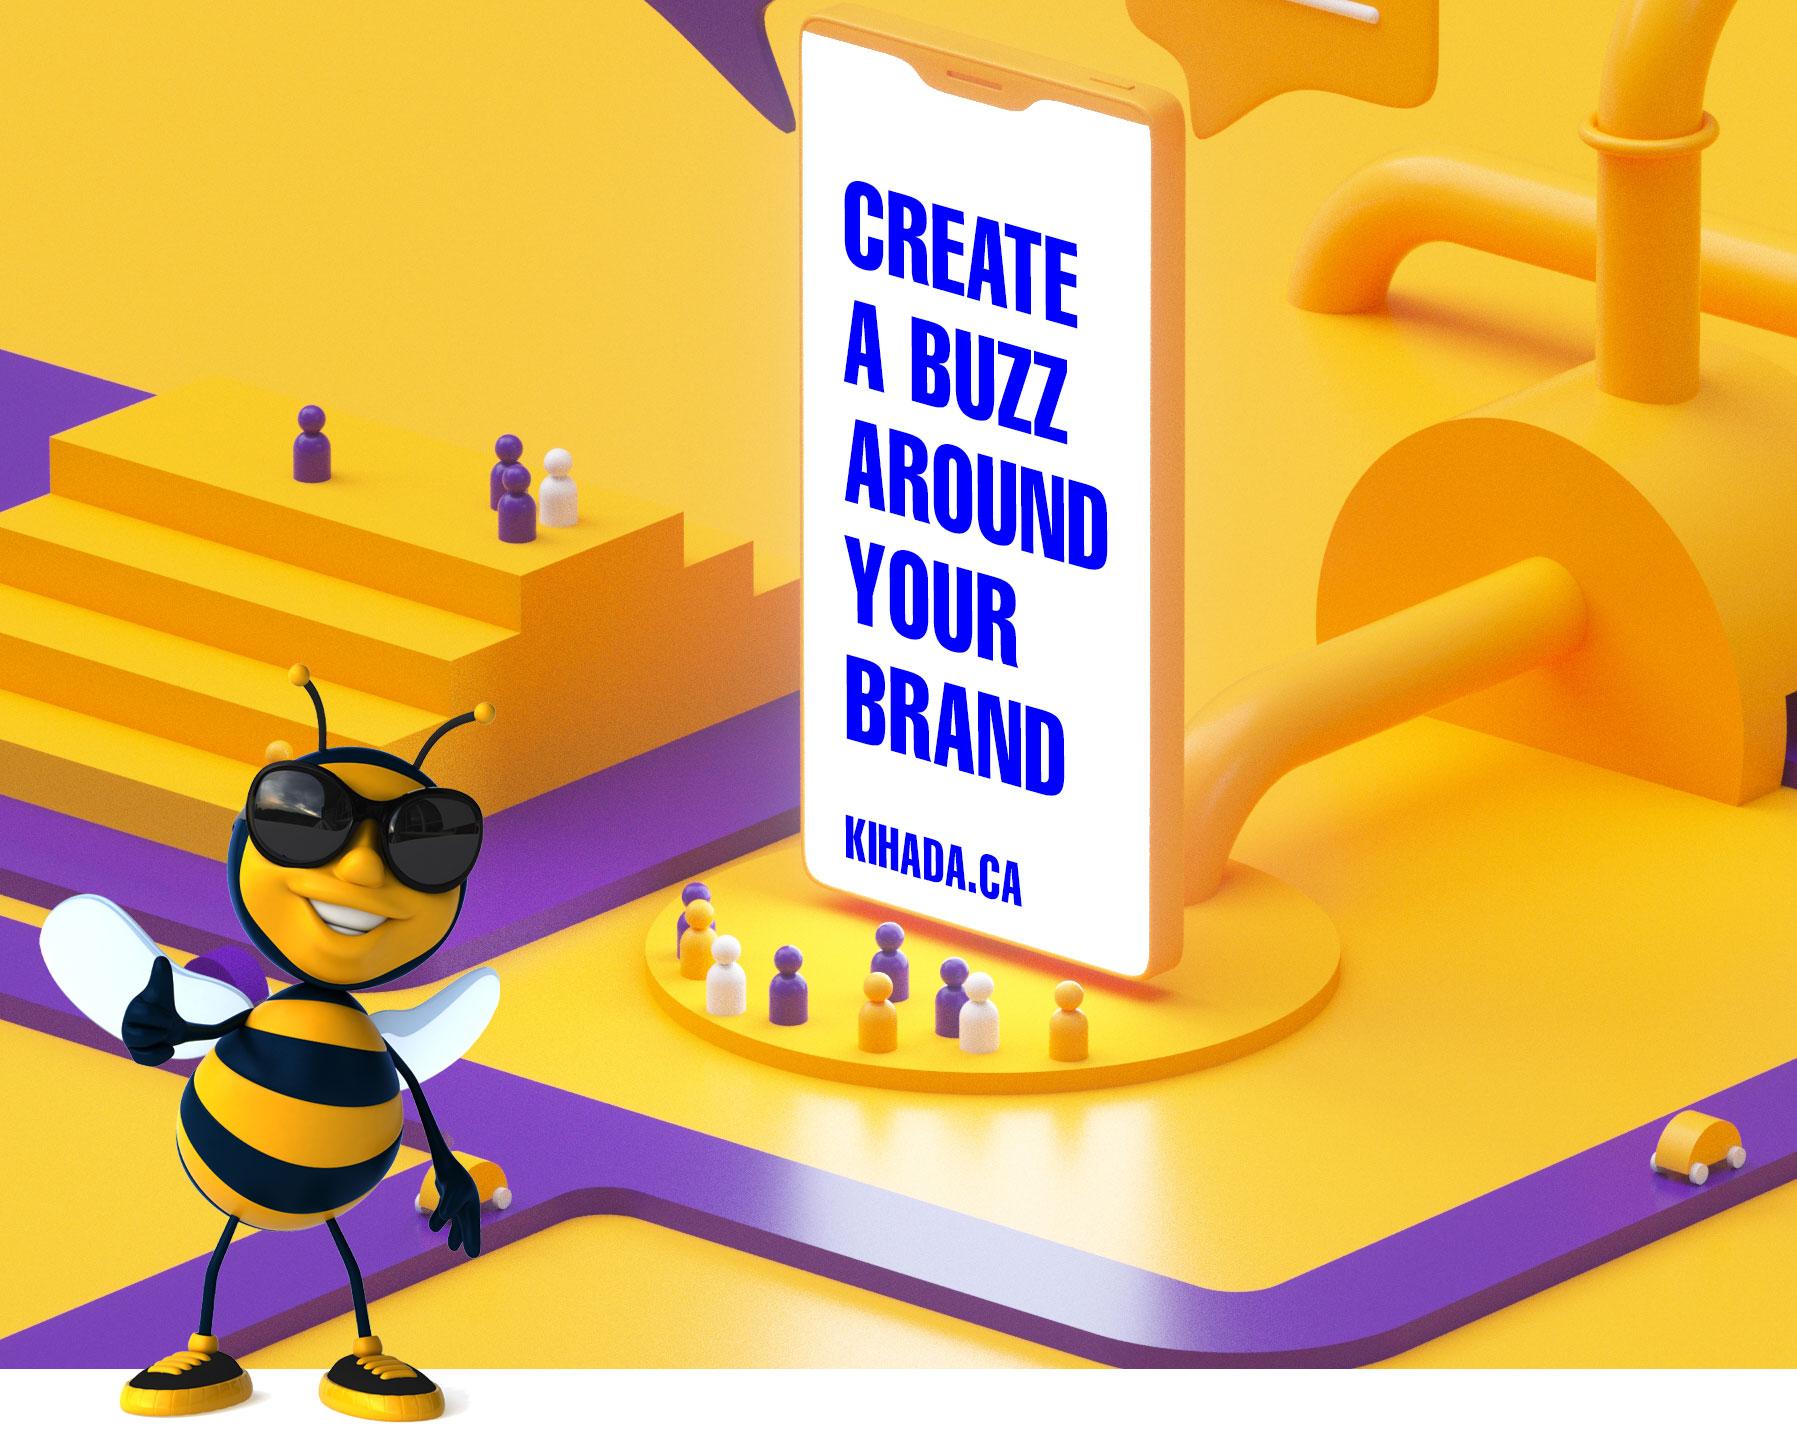 Create a buzz around your brand kihada